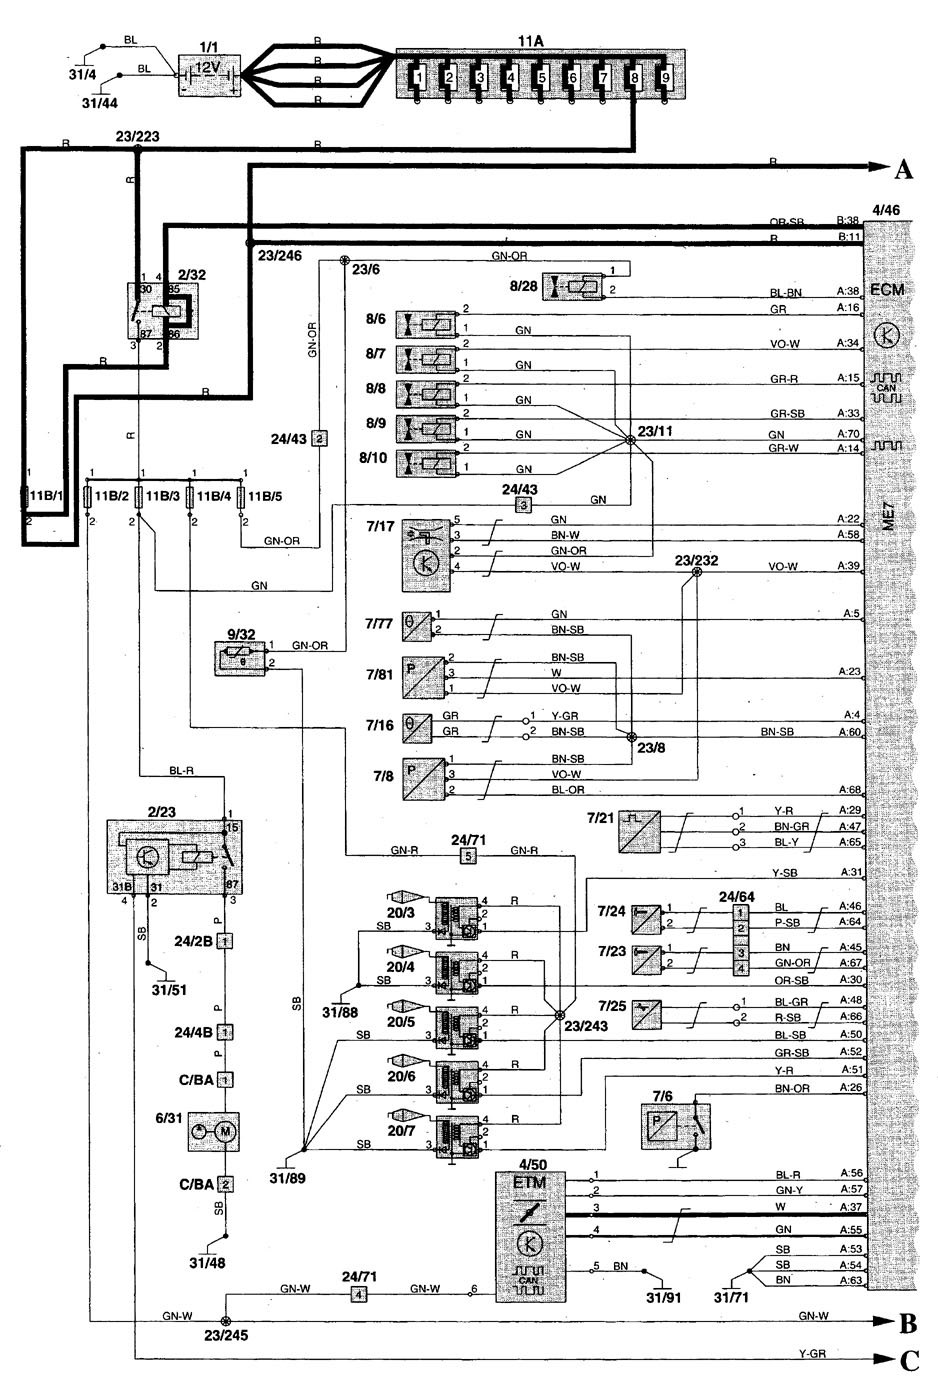 1981 honda pport wiring diagram  honda  auto wiring diagram